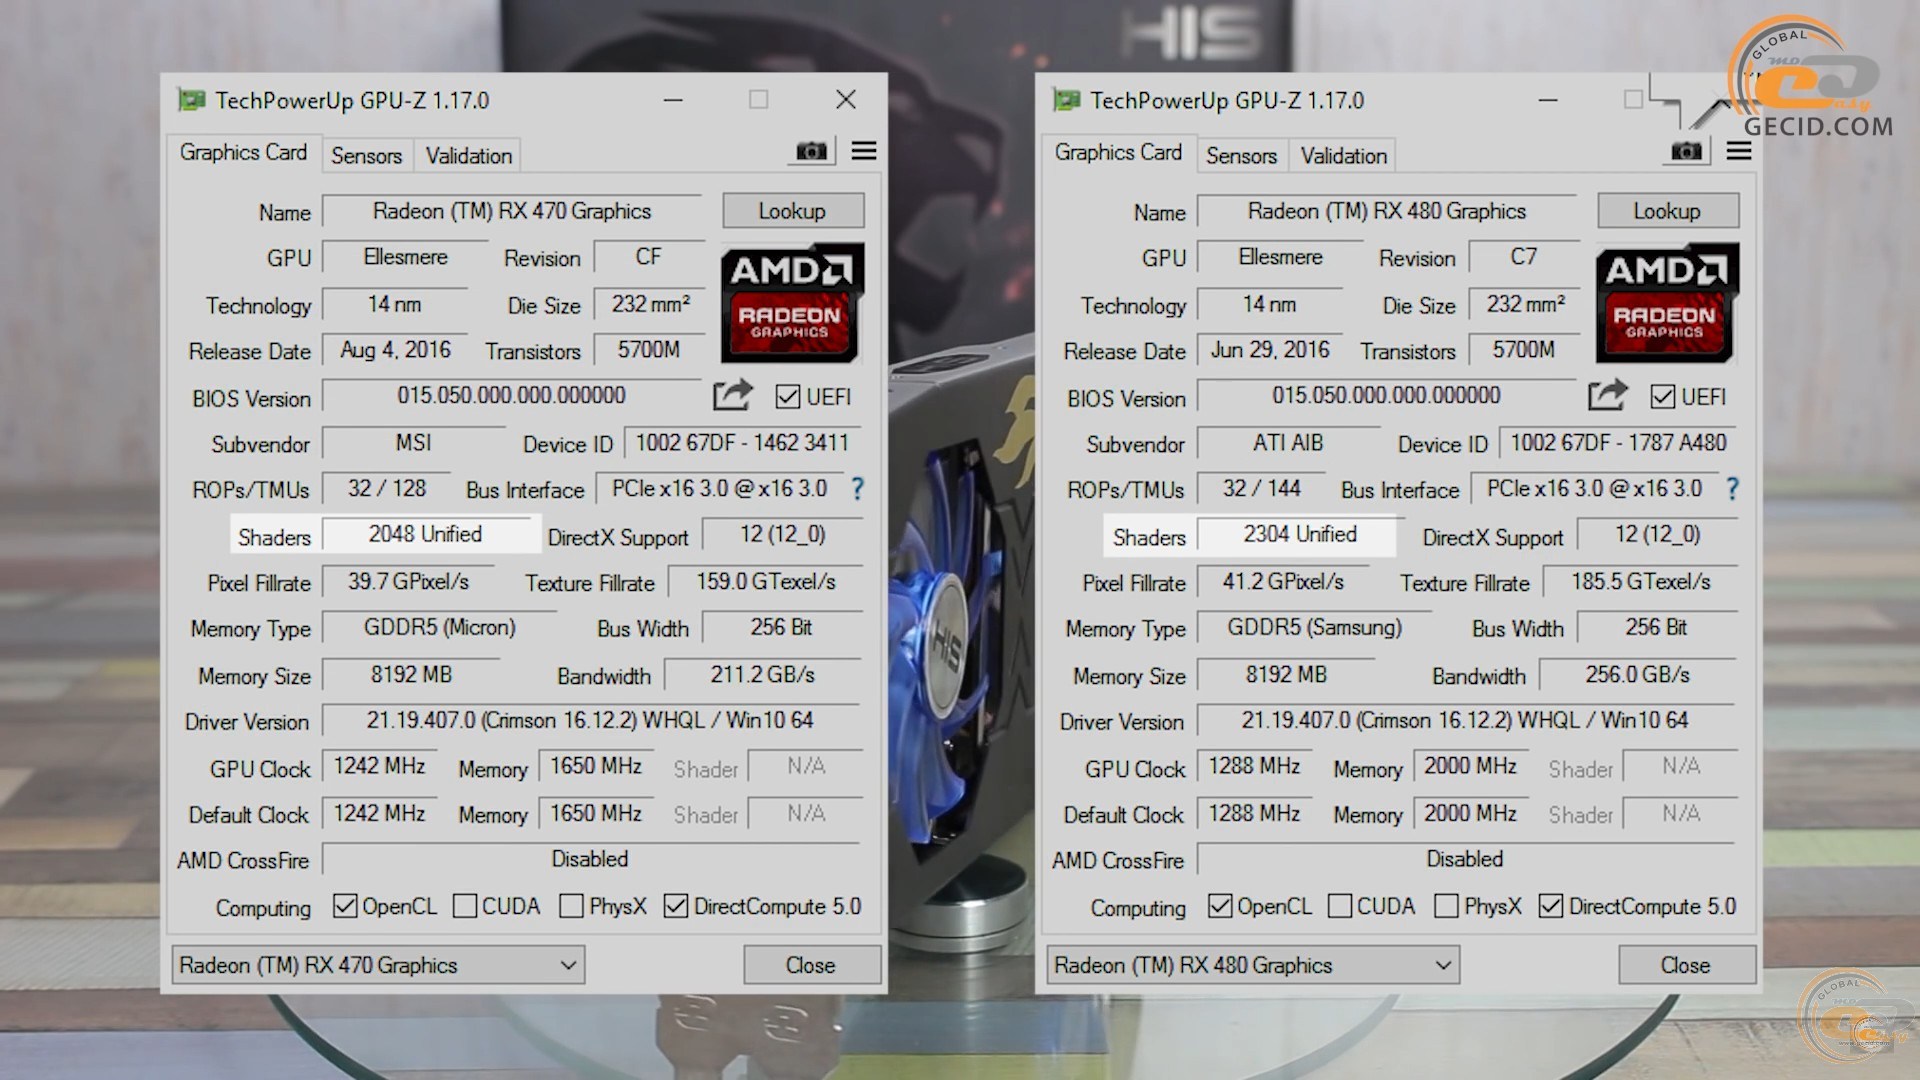 GECID com IT-portal: AMD Radeon RX 480 vs RX 470